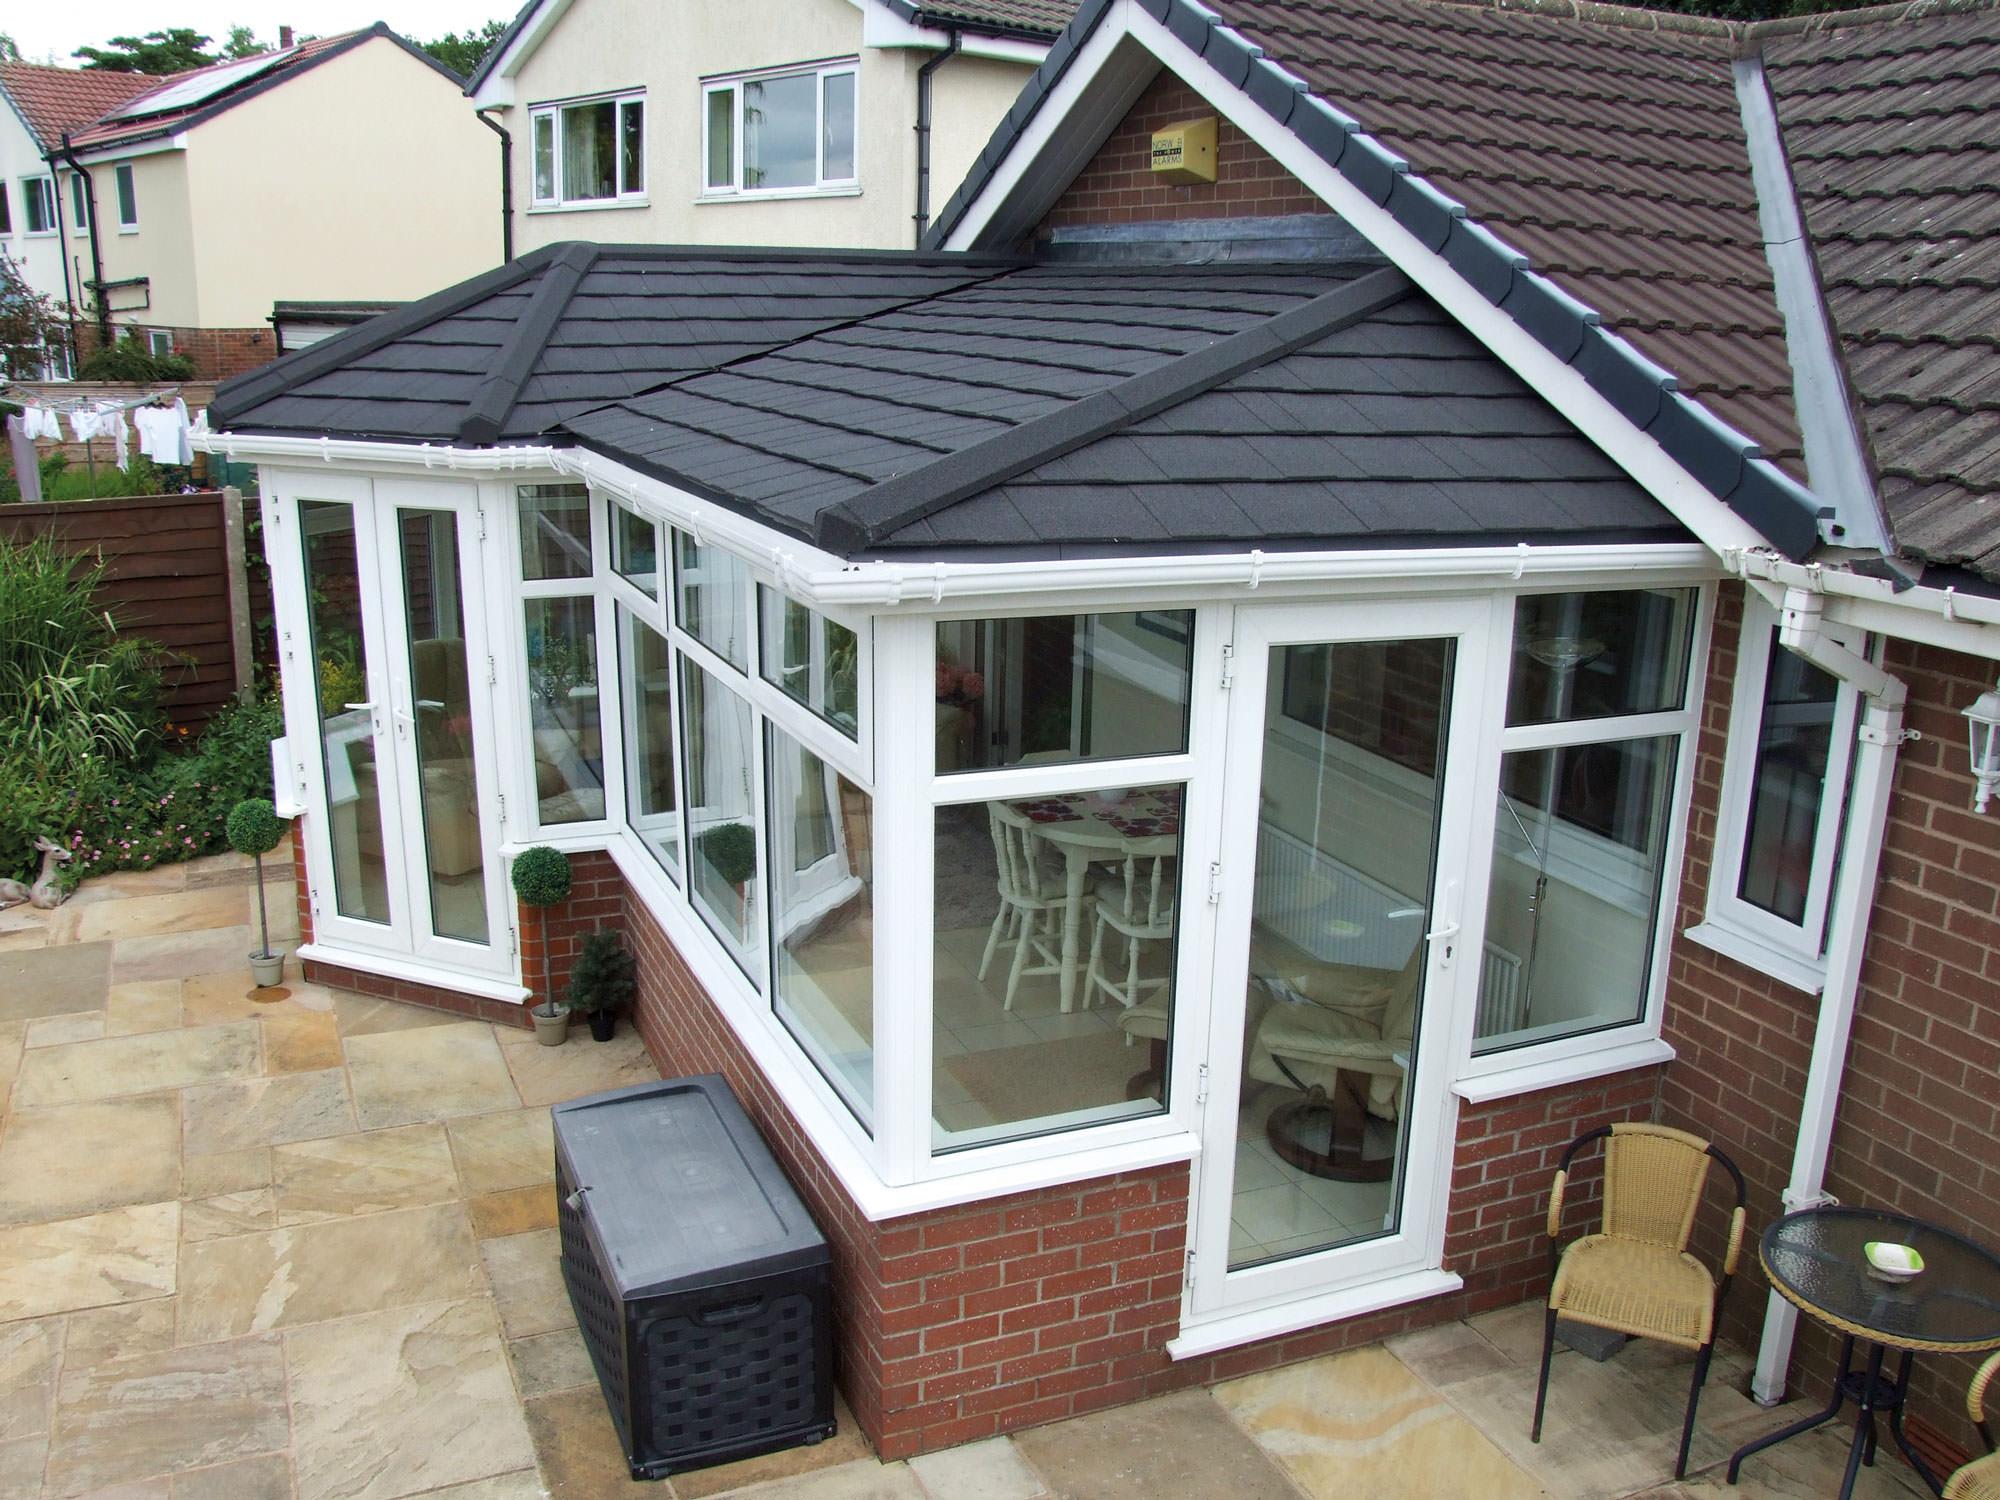 Tiled Roof Conservatories Bradford Leeds Conservatory